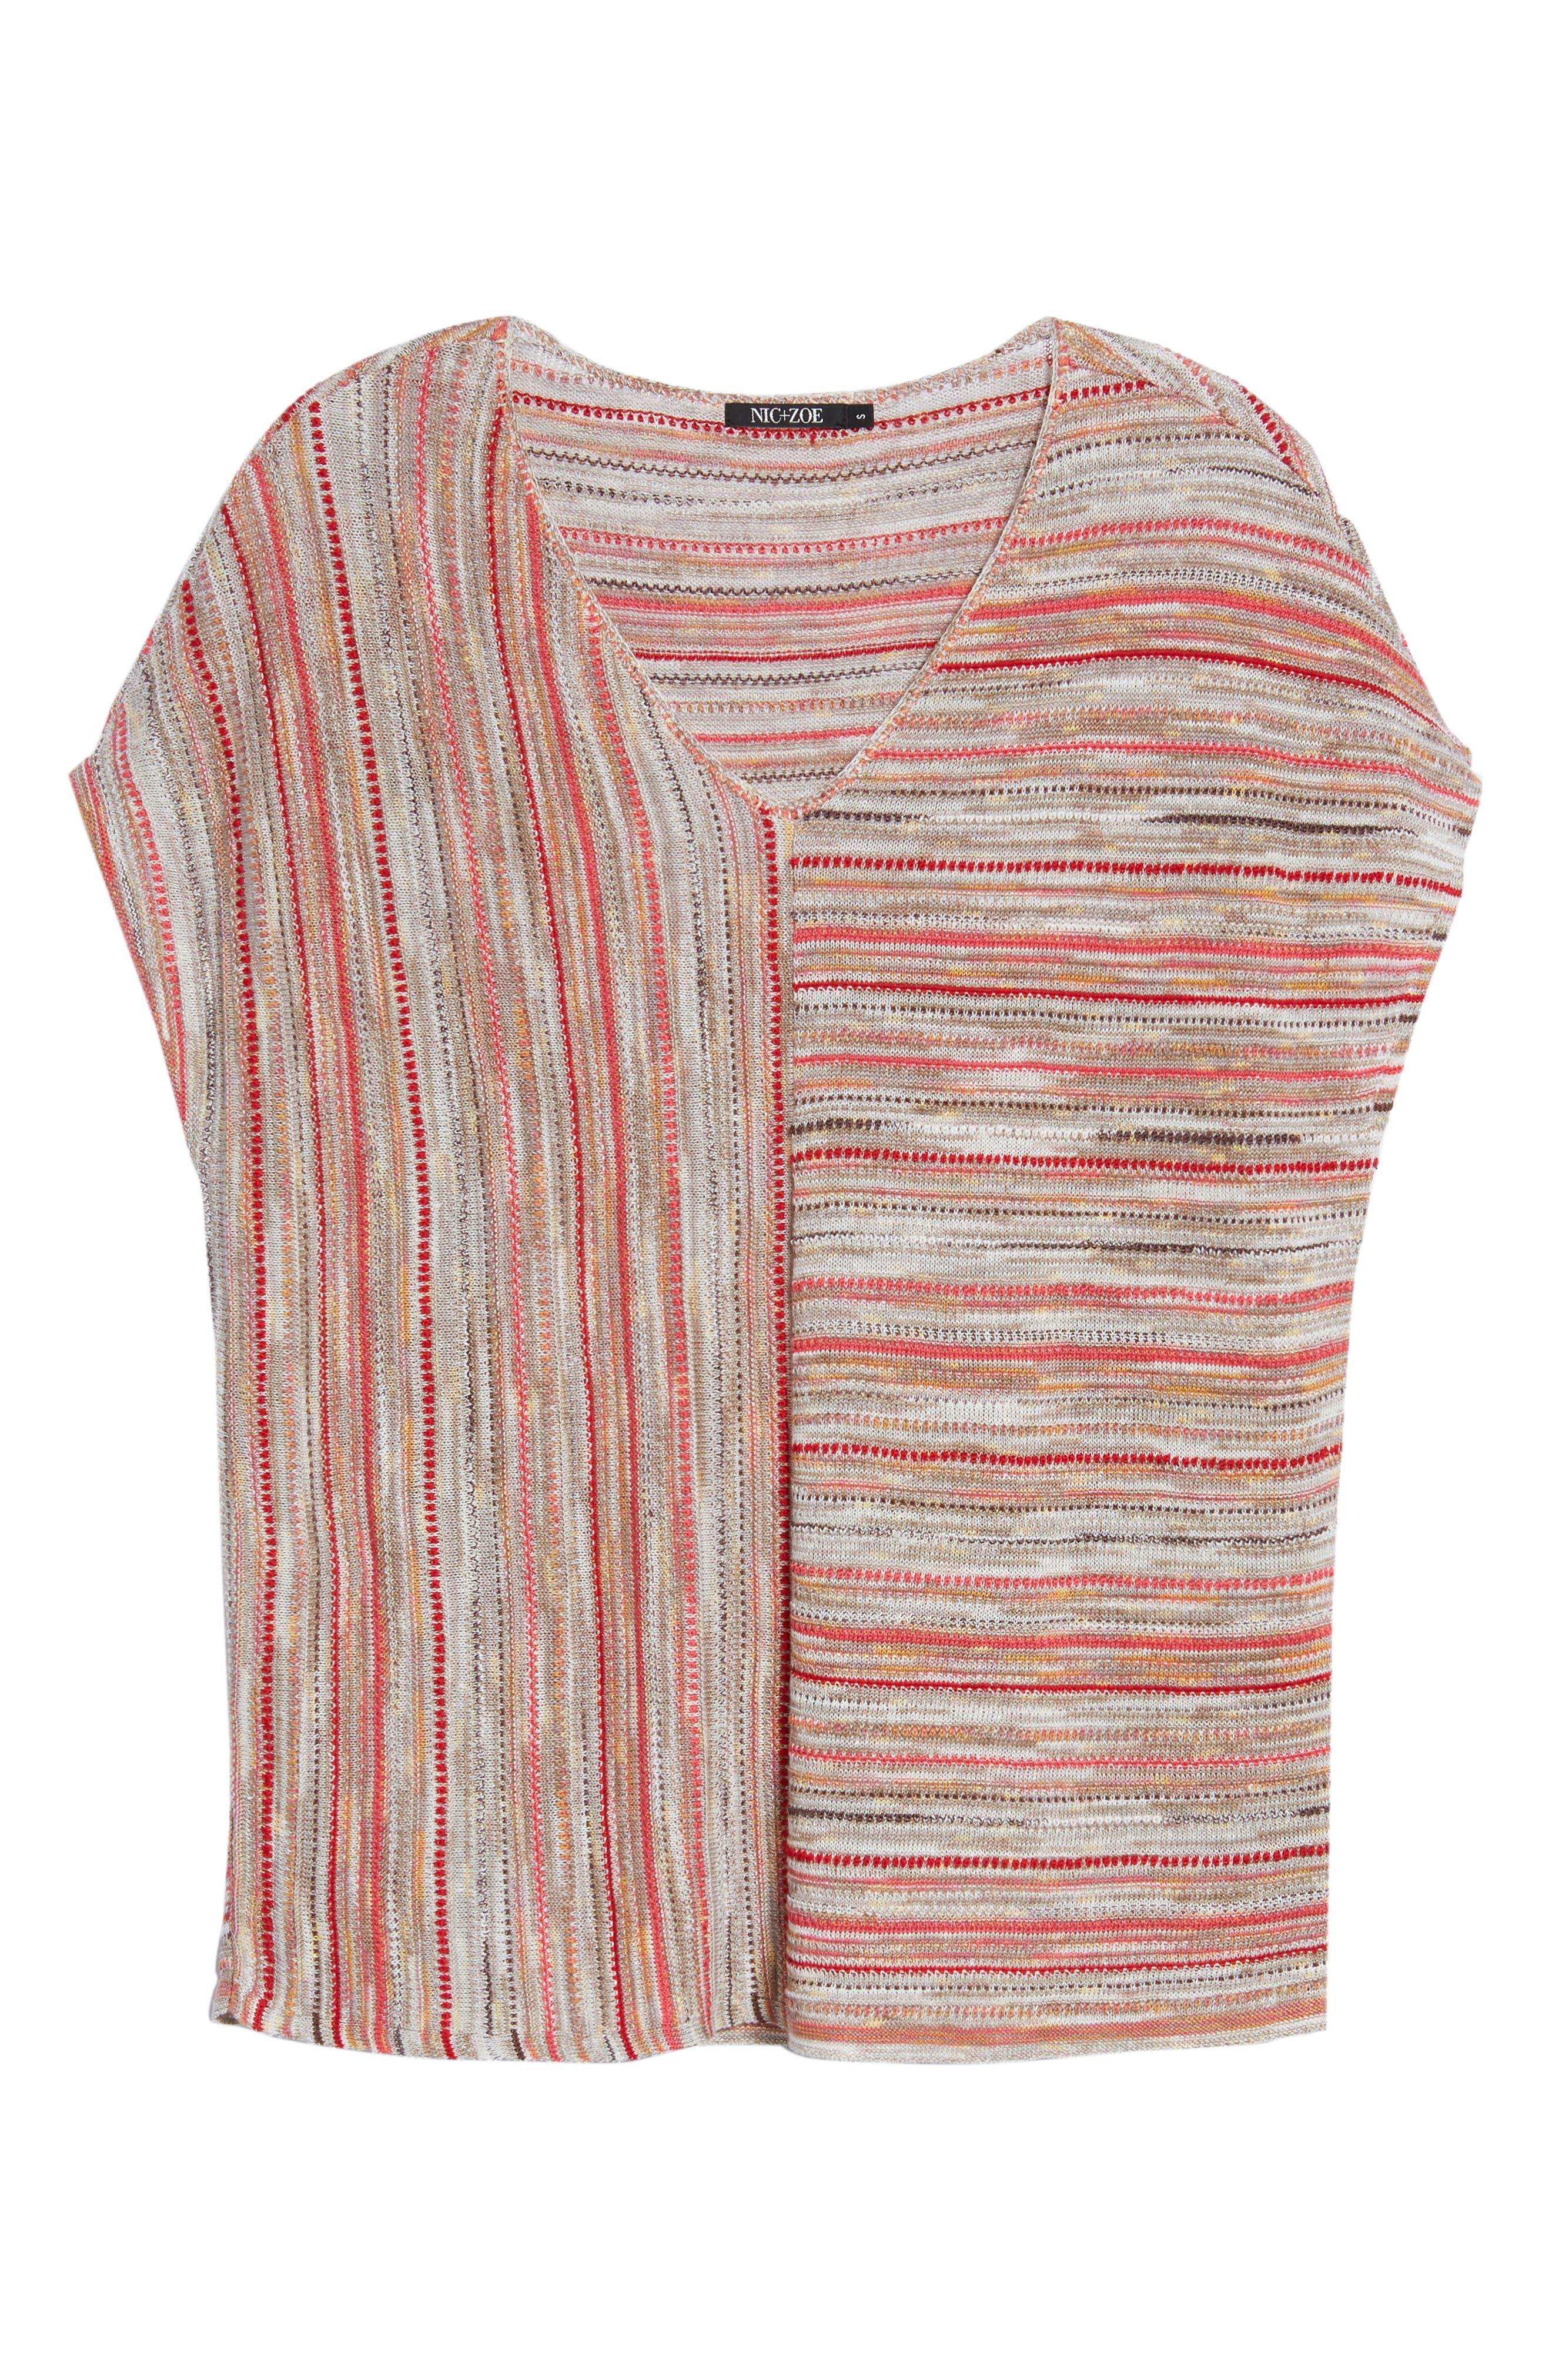 Arizona Sunset Knit Top,                             Alternate thumbnail 6, color,                             600